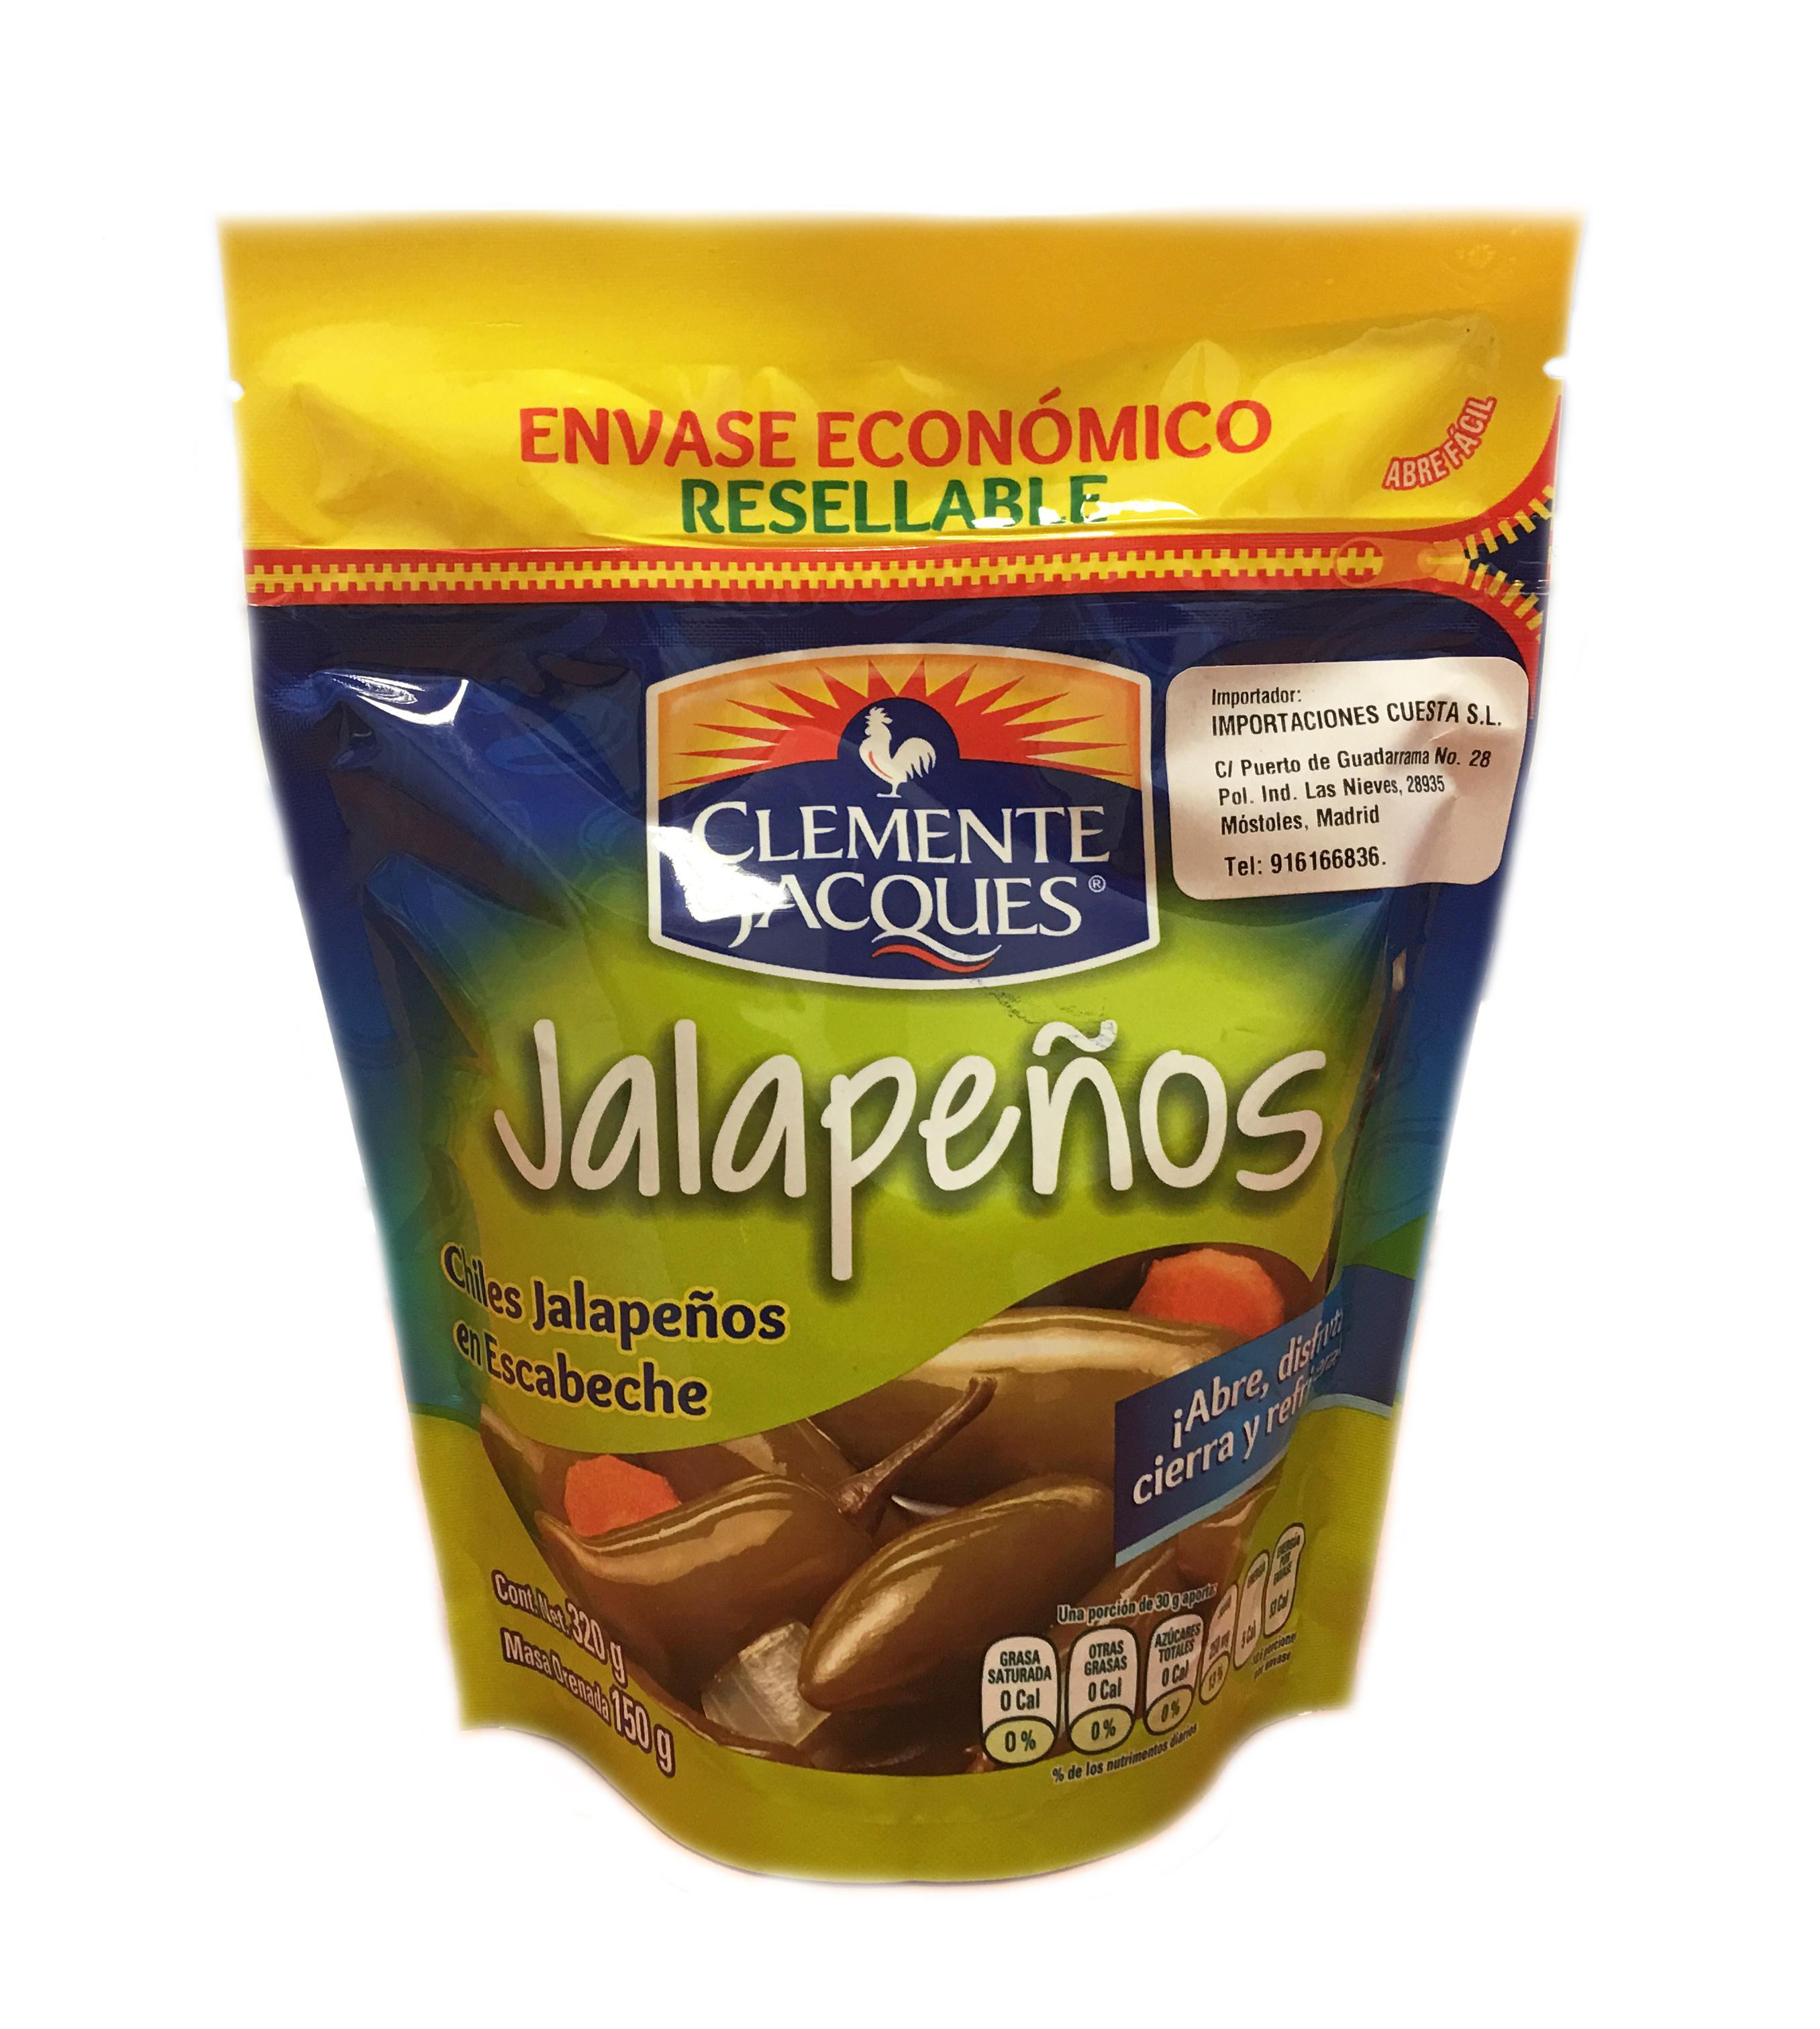 Jalapeños enteros bolsa Clemente Jacques 320gr Bolsa Plástico